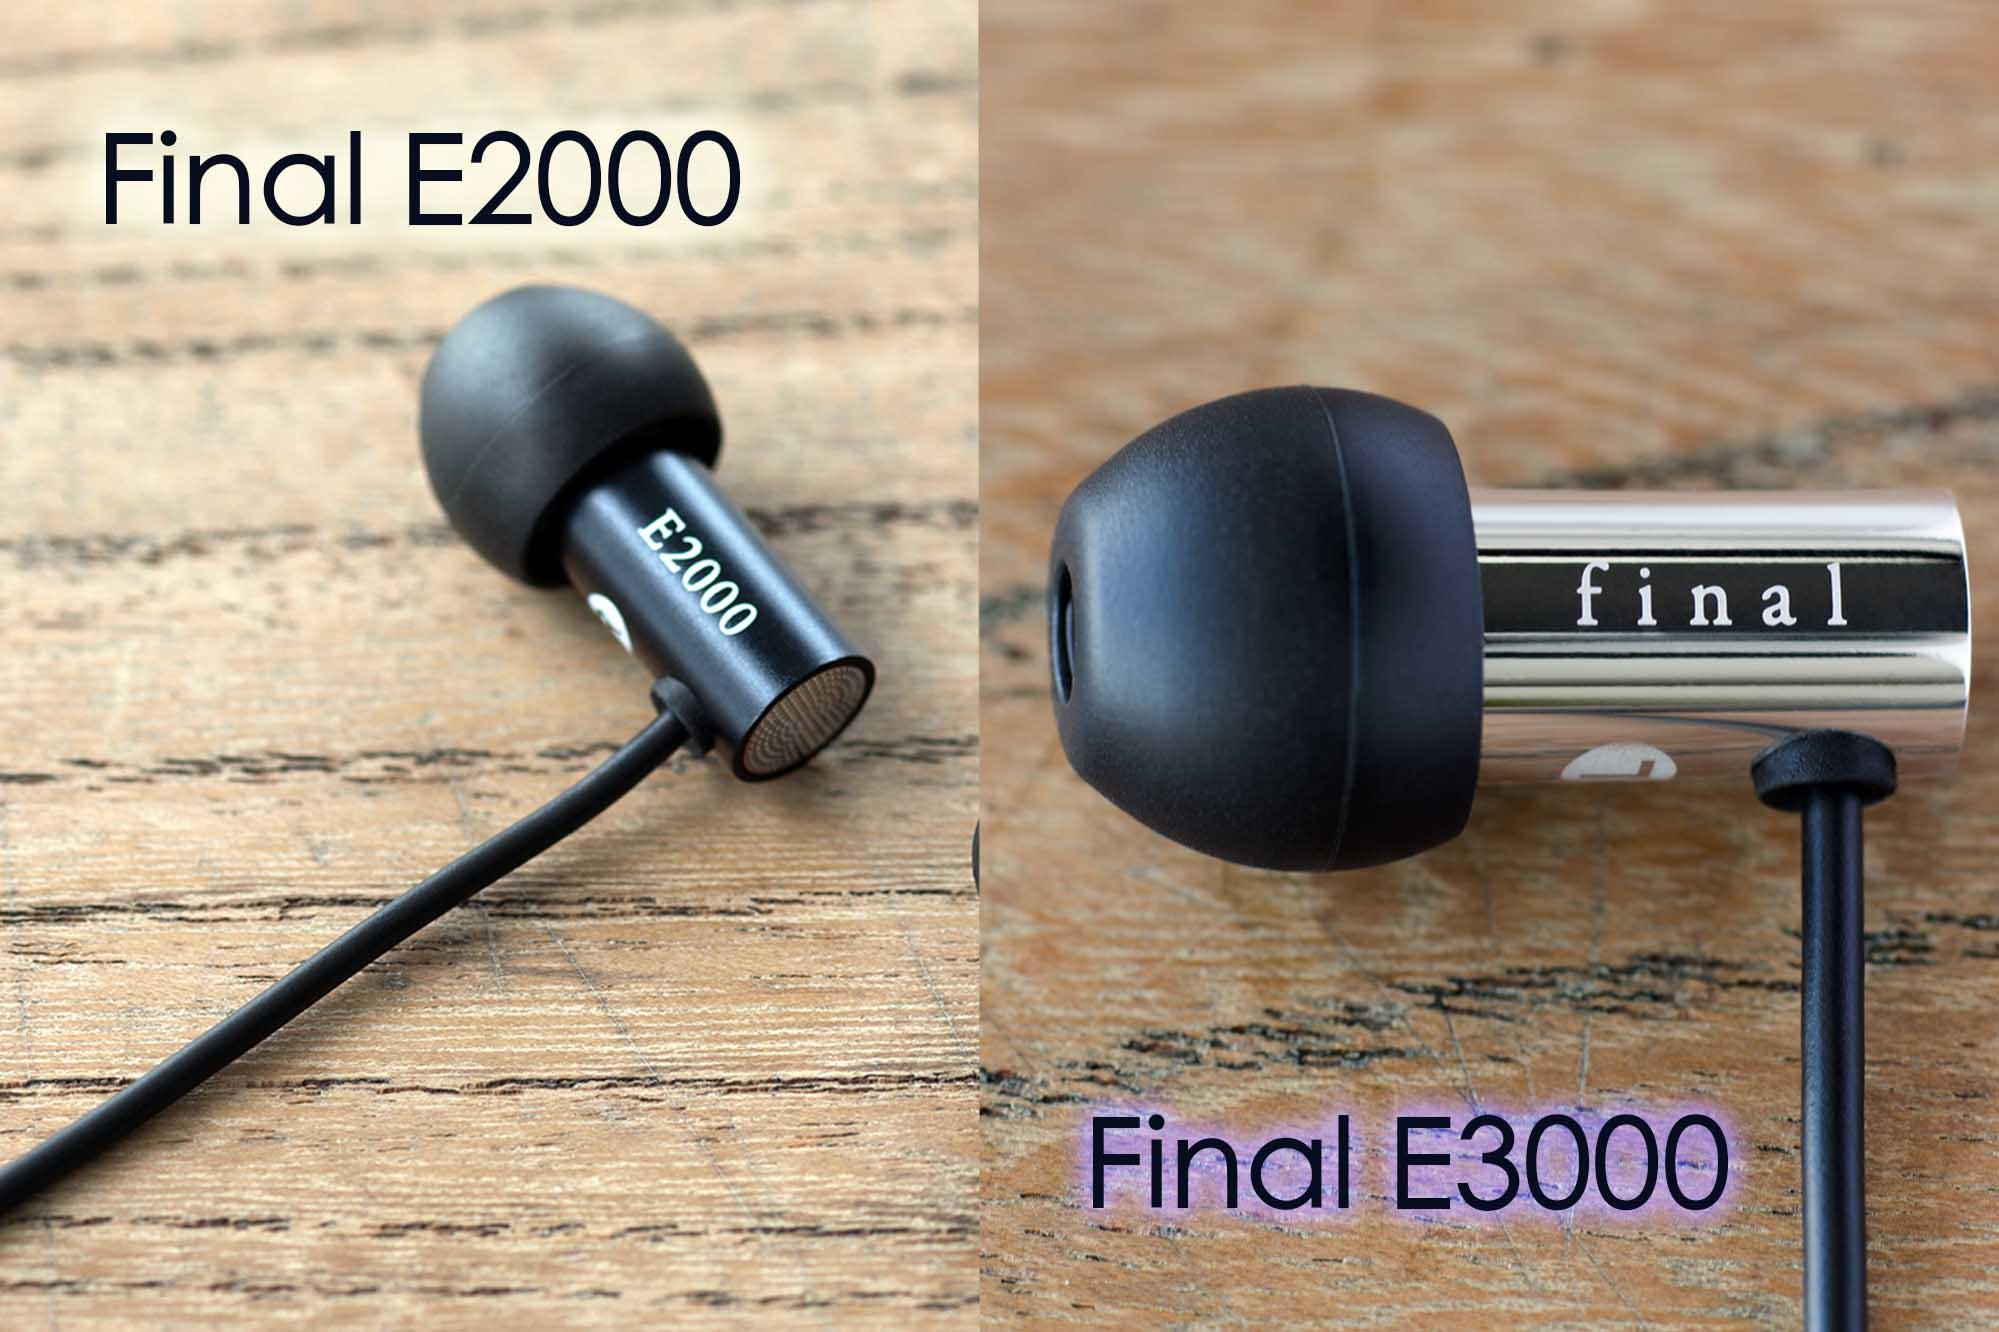 Final 推平價入門級耳機  Final E3000 / Final E2000 不足 HK$500